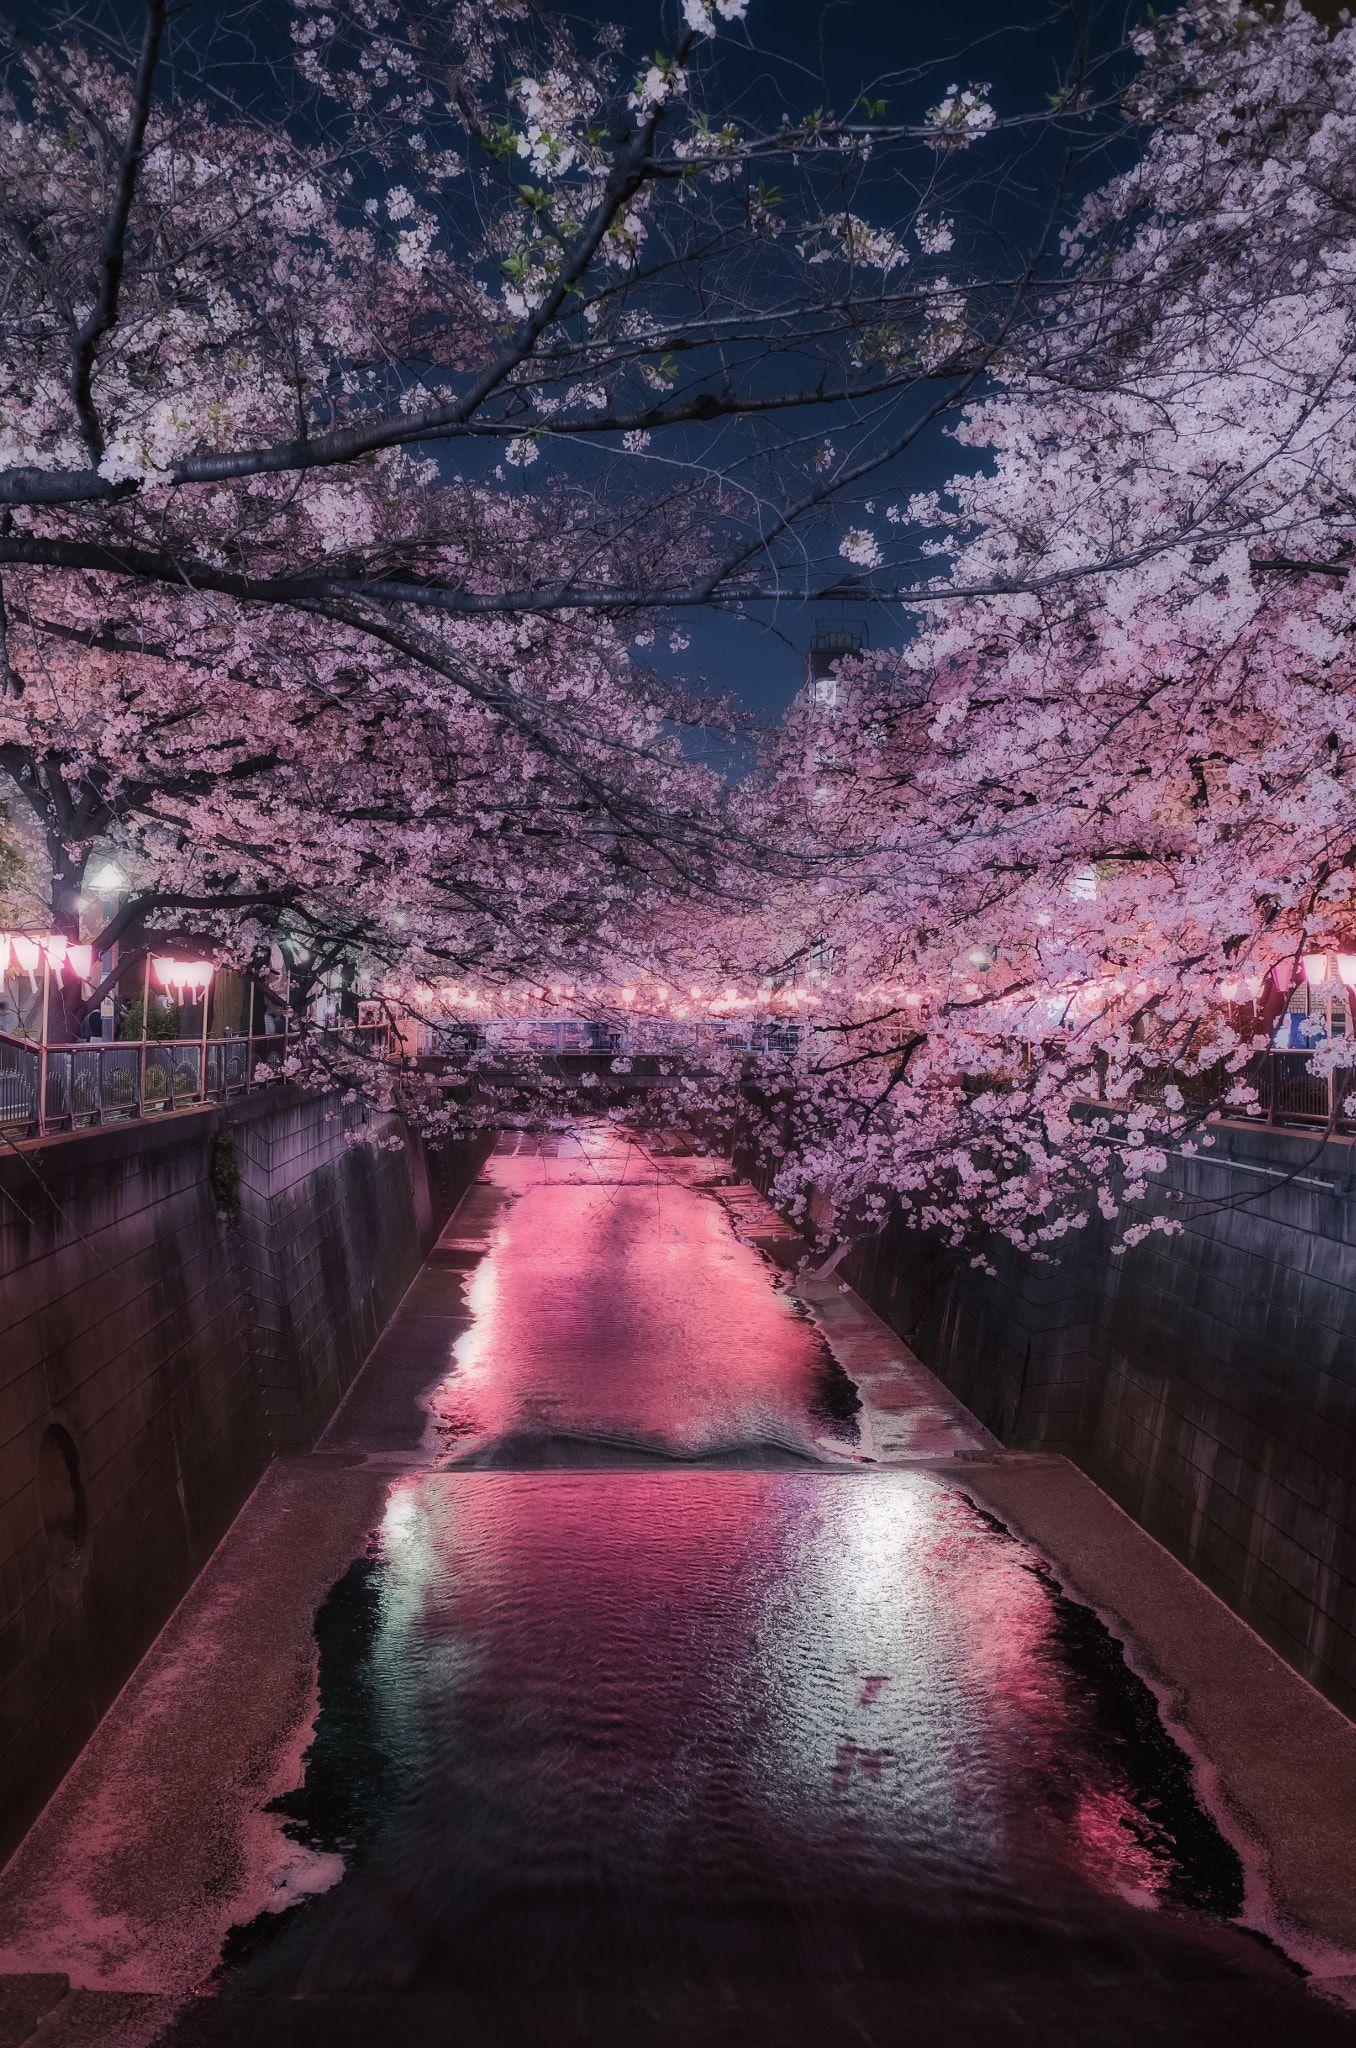 Night Cherry Blossom 03 29 18 Cherry Blossom Wallpaper Cherry Blossom Wallpaper Iphone Cherry Blossom Japan